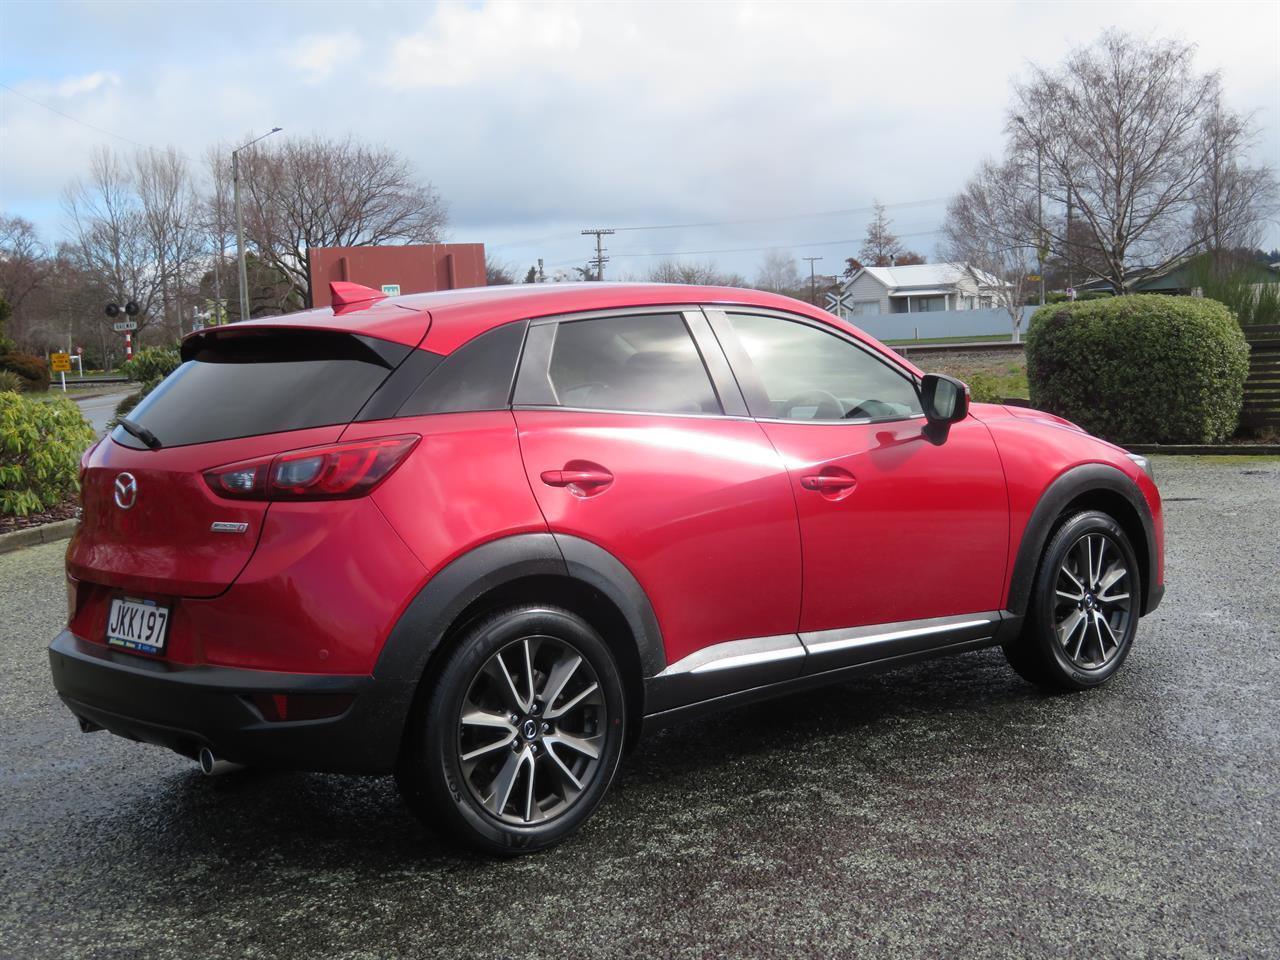 image-3, 2015 Mazda CX-3 LTD AWD at Gore